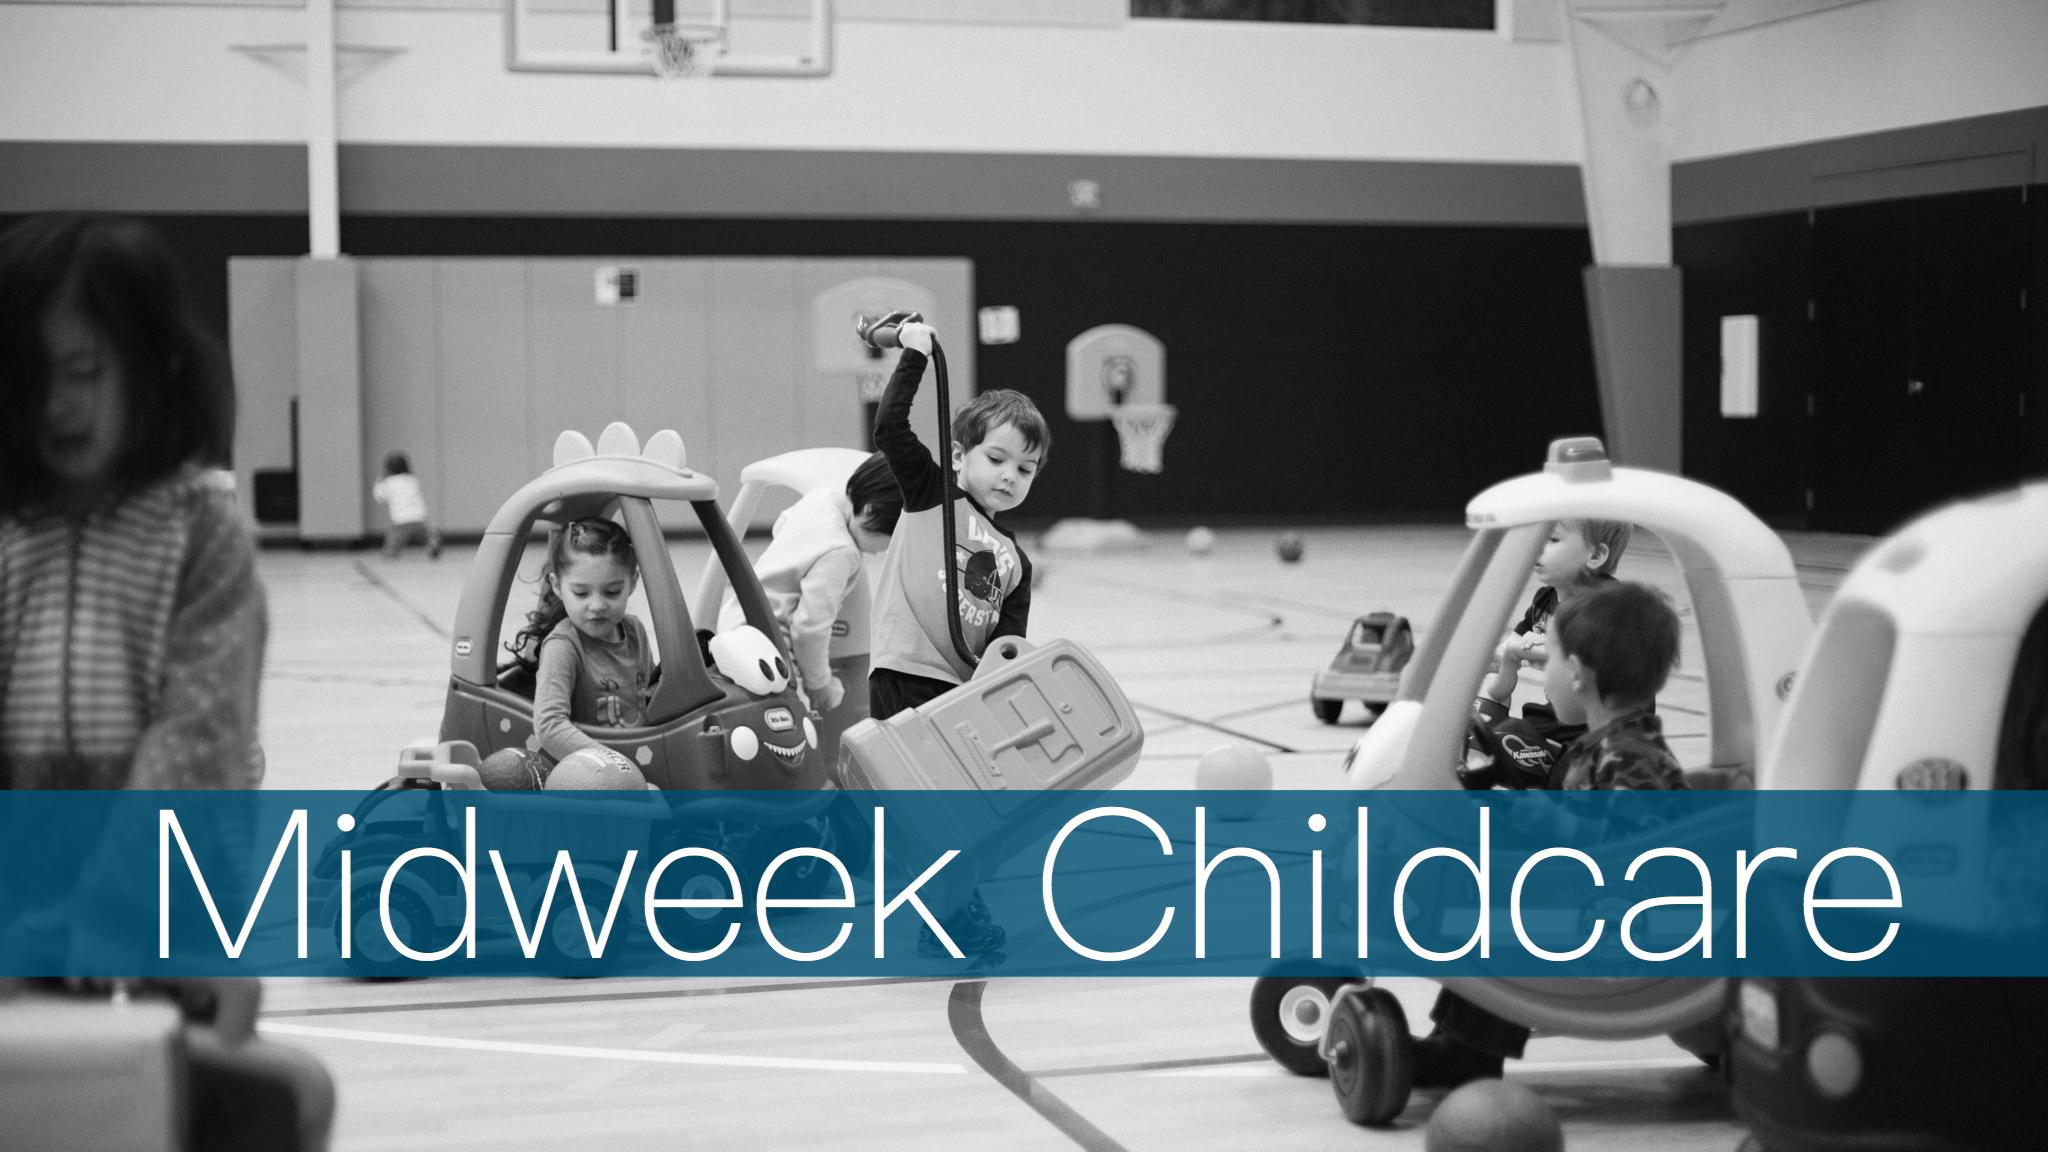 Midweek Childcare.jpeg